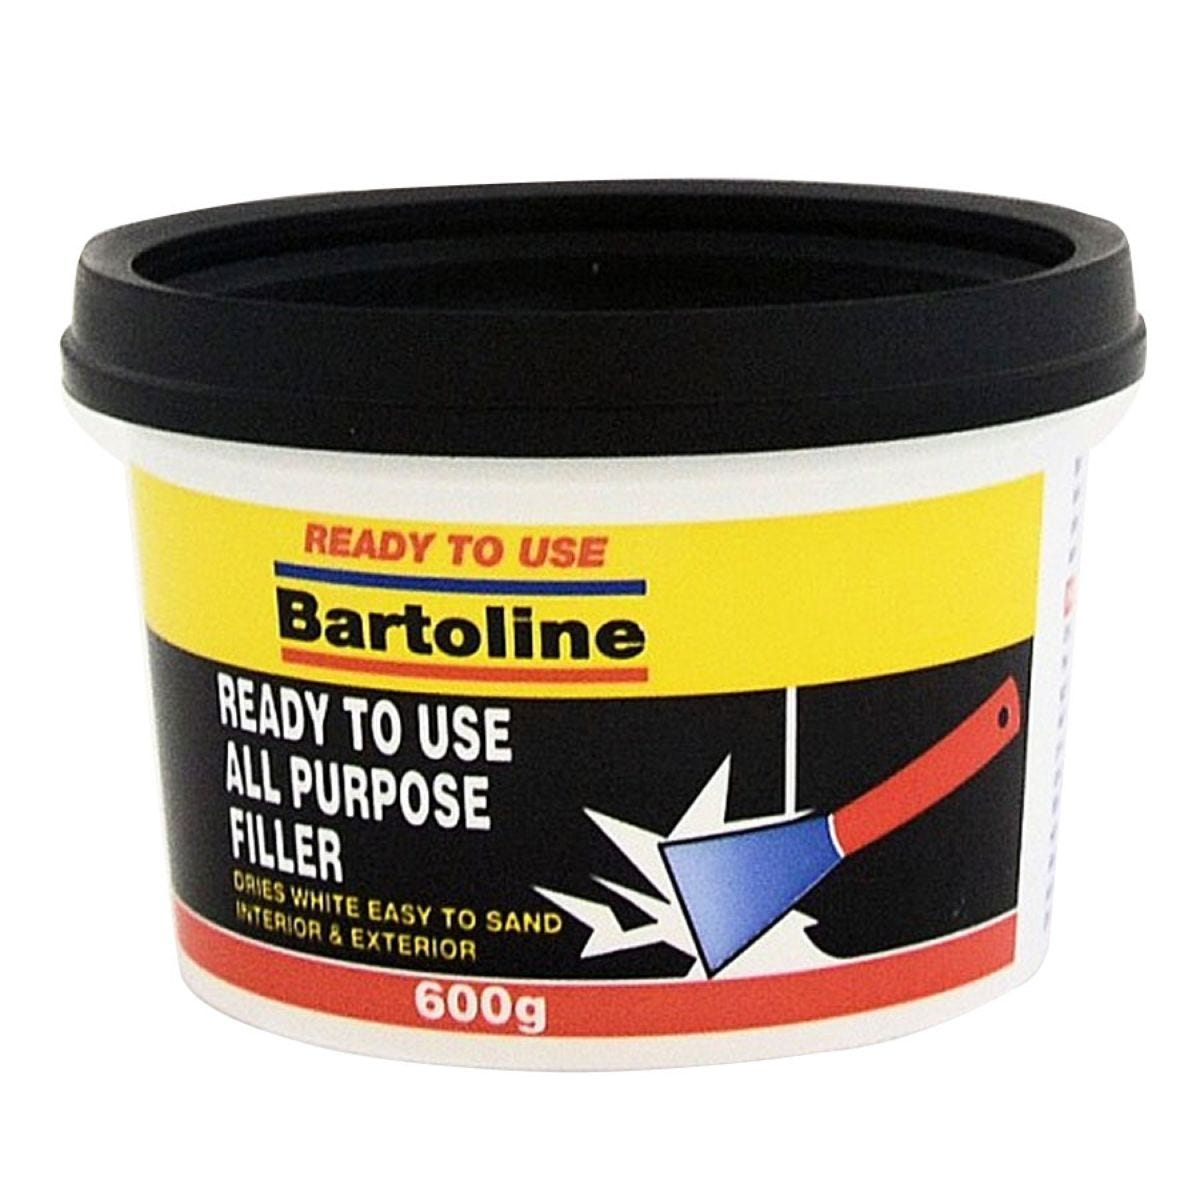 Bartoline All Purpose Readymix Filler 600g